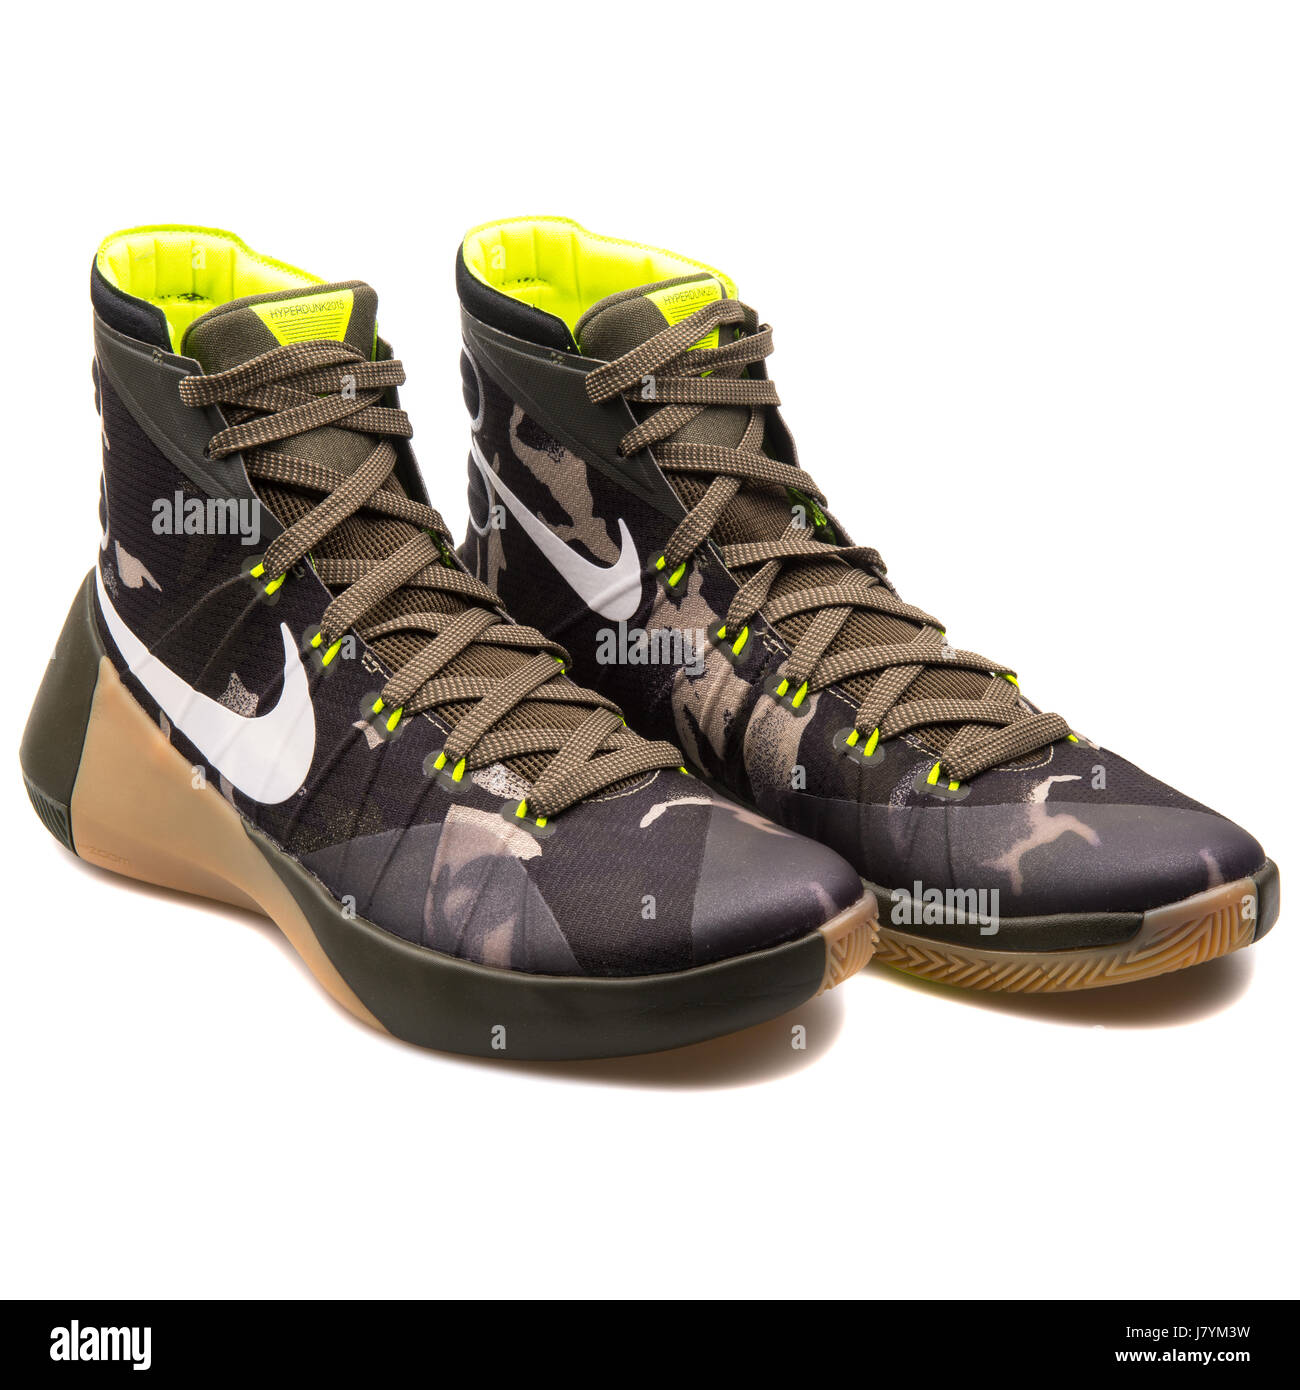 designer fashion 5c060 5702c Nike Hyperdunk 2015 PRM Men Dark Camo Khaki Basketball Sneakers - 749567-313